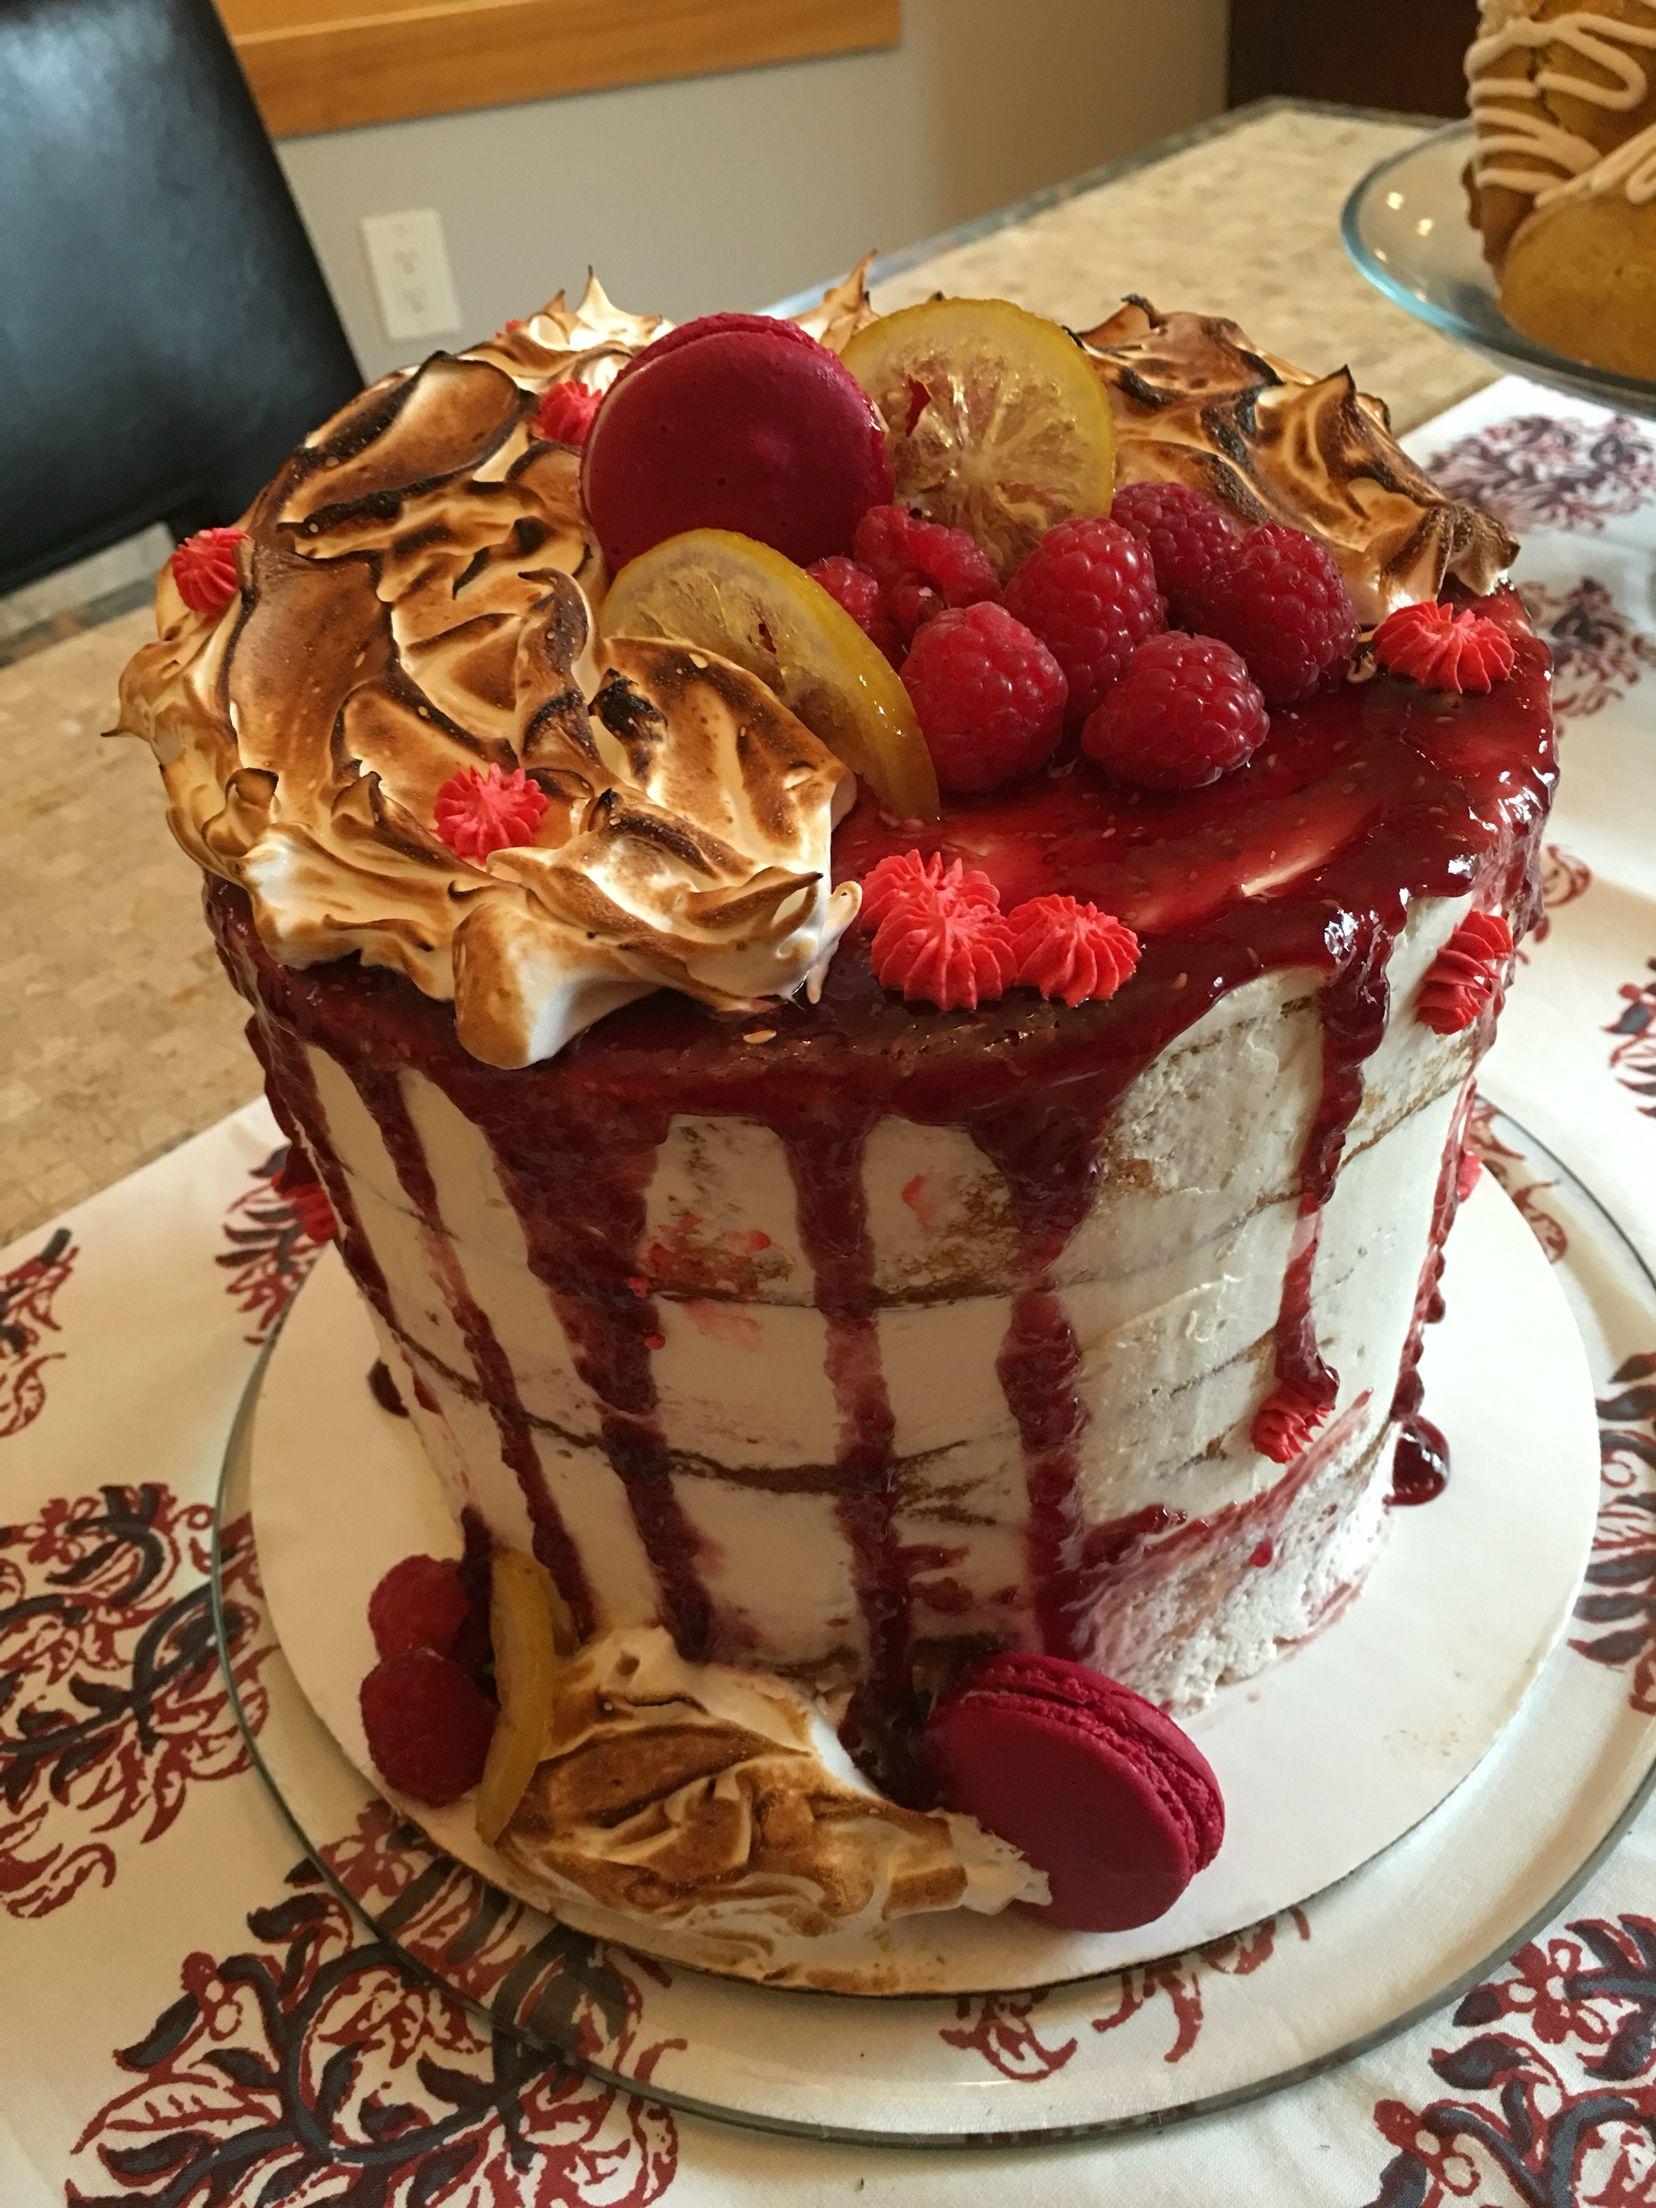 Admirable The Best Birthday Cake Ever Mediterra Cakehouse Pittsburgh Funny Birthday Cards Online Barepcheapnameinfo